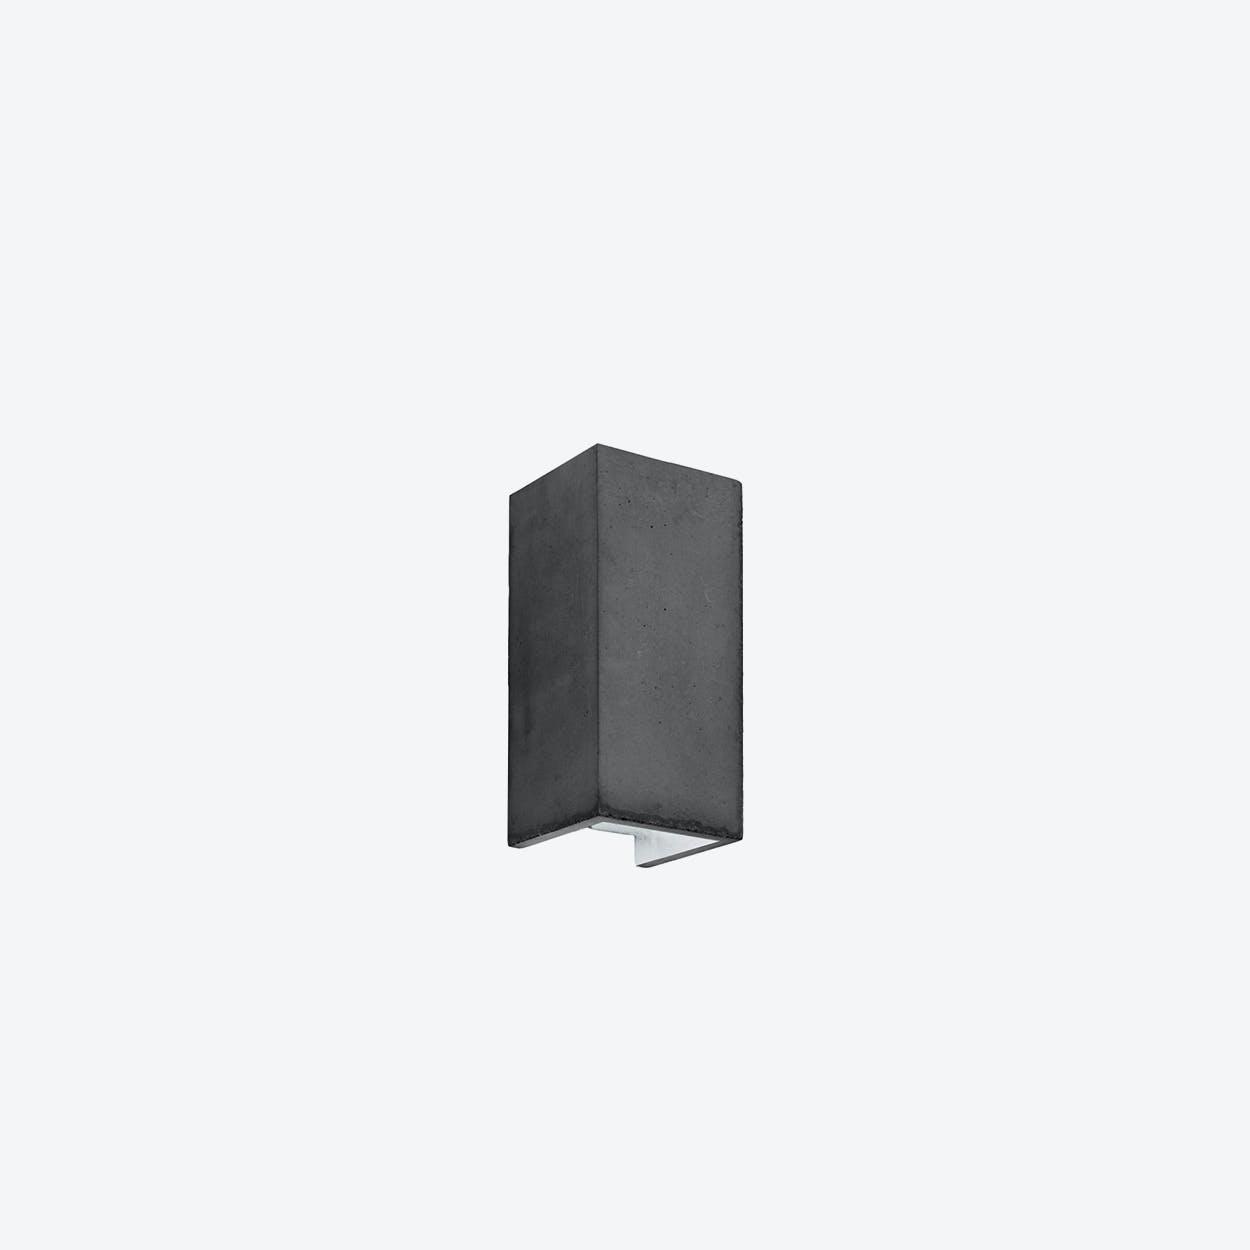 Concrete Wall Light Retangular B8 in Dark Grey and Silver